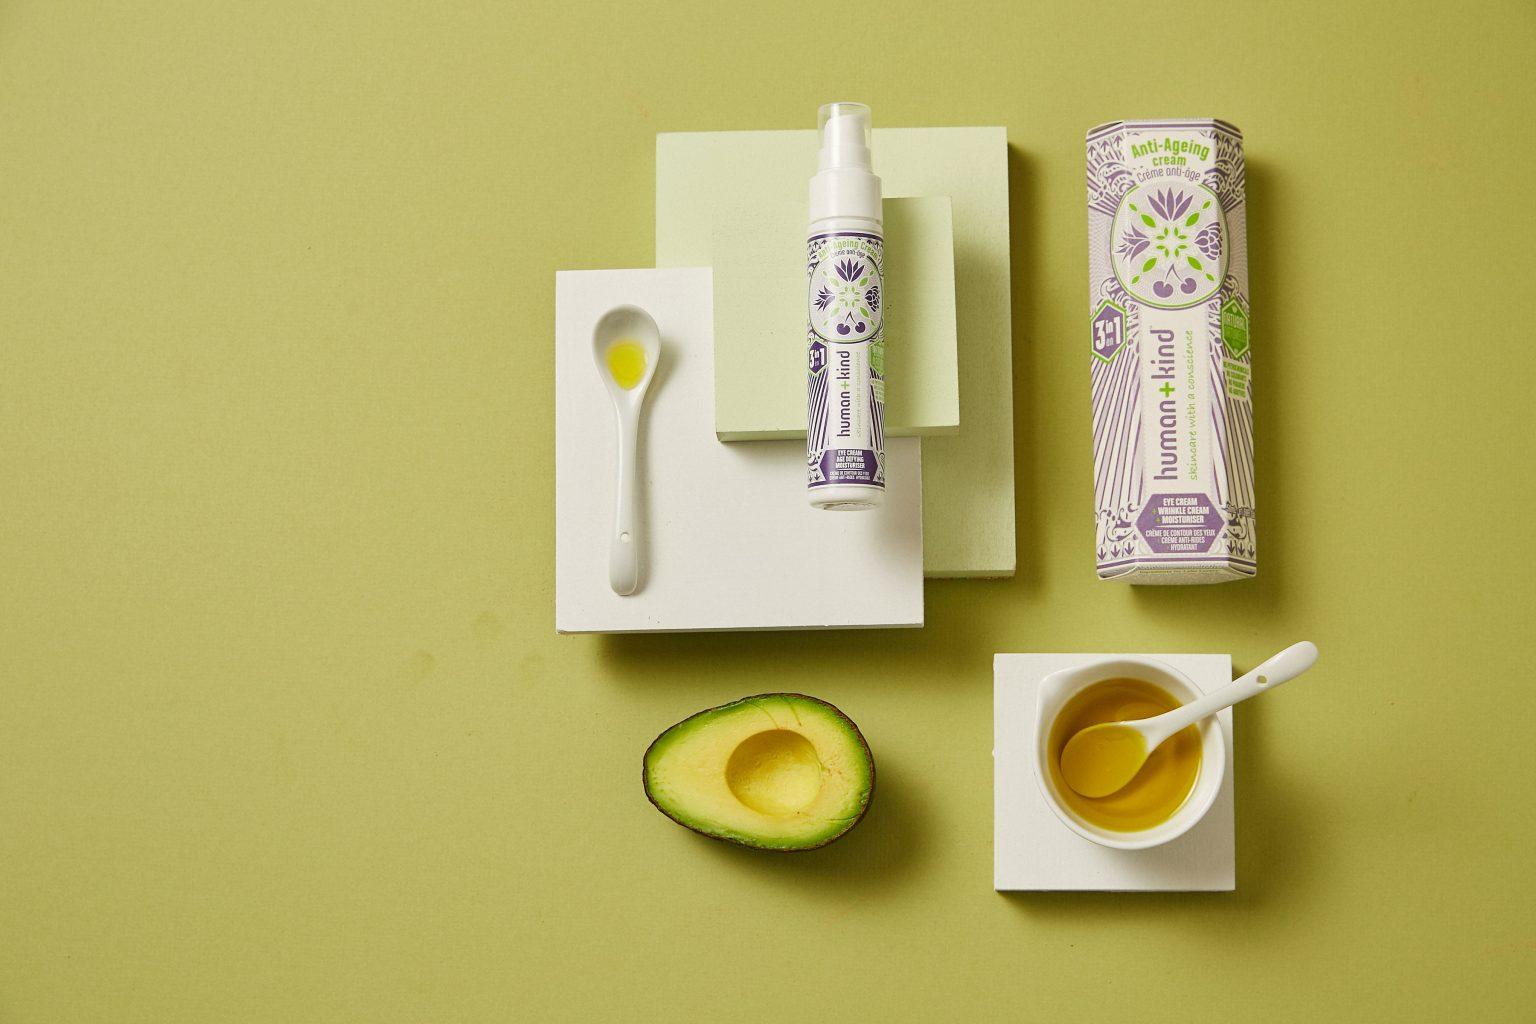 wholesaler distributor organic and natural cosmetics and make-up